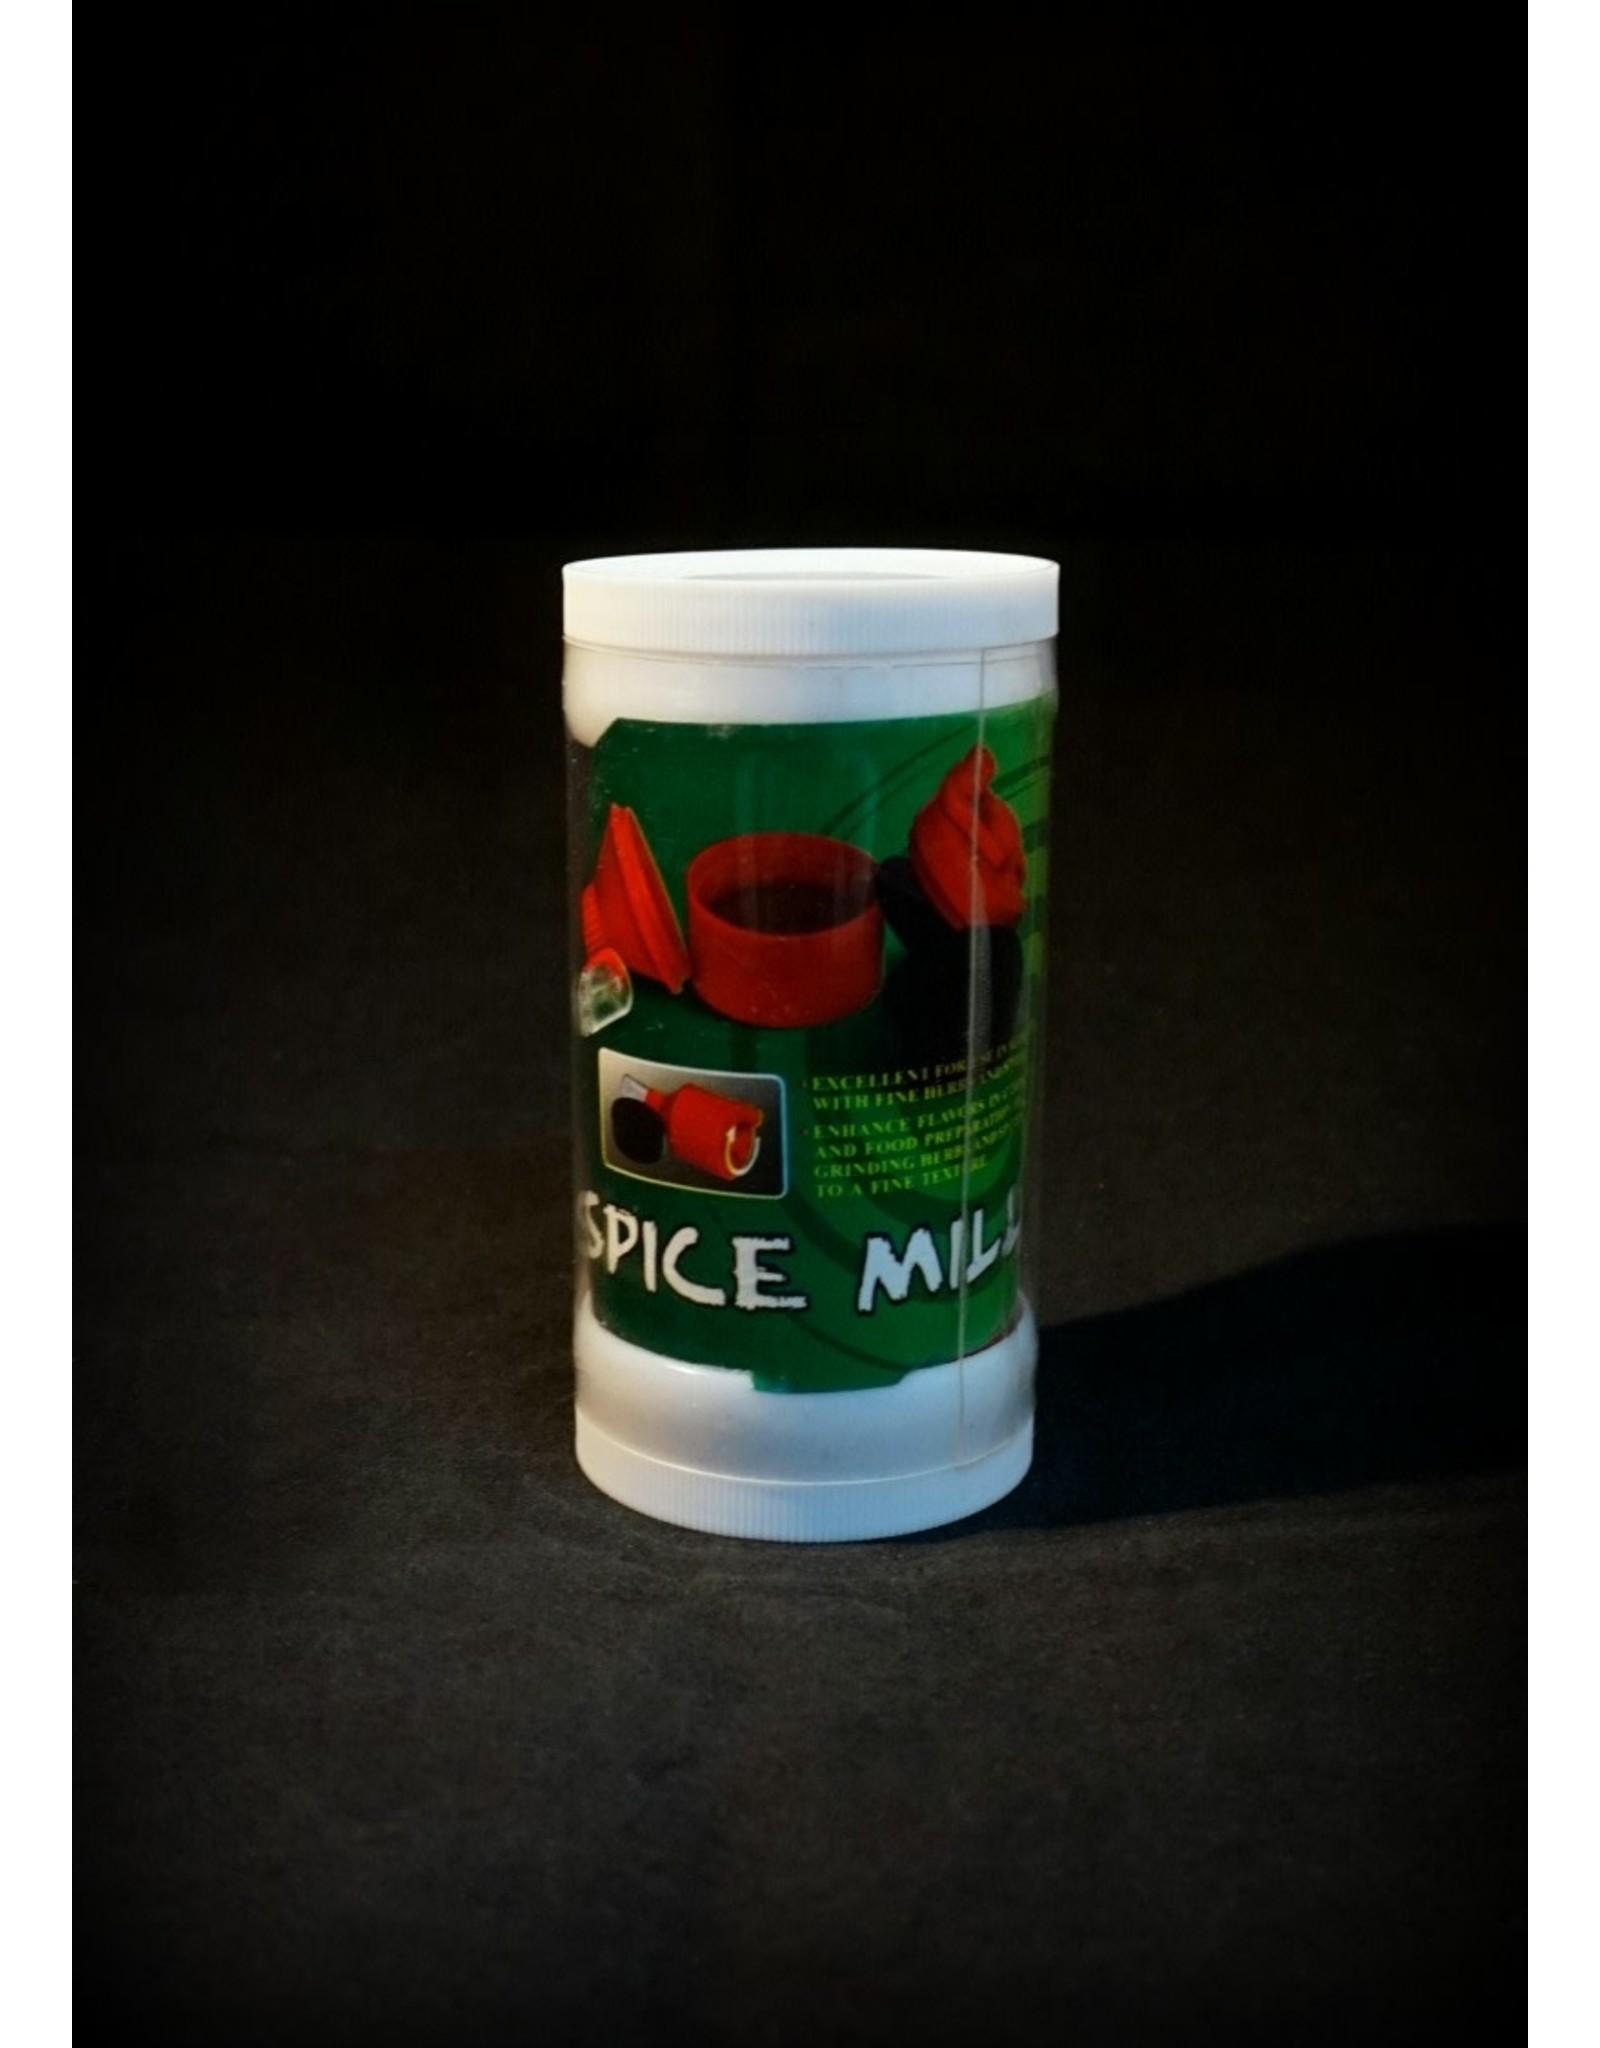 Plastic Spice Mill